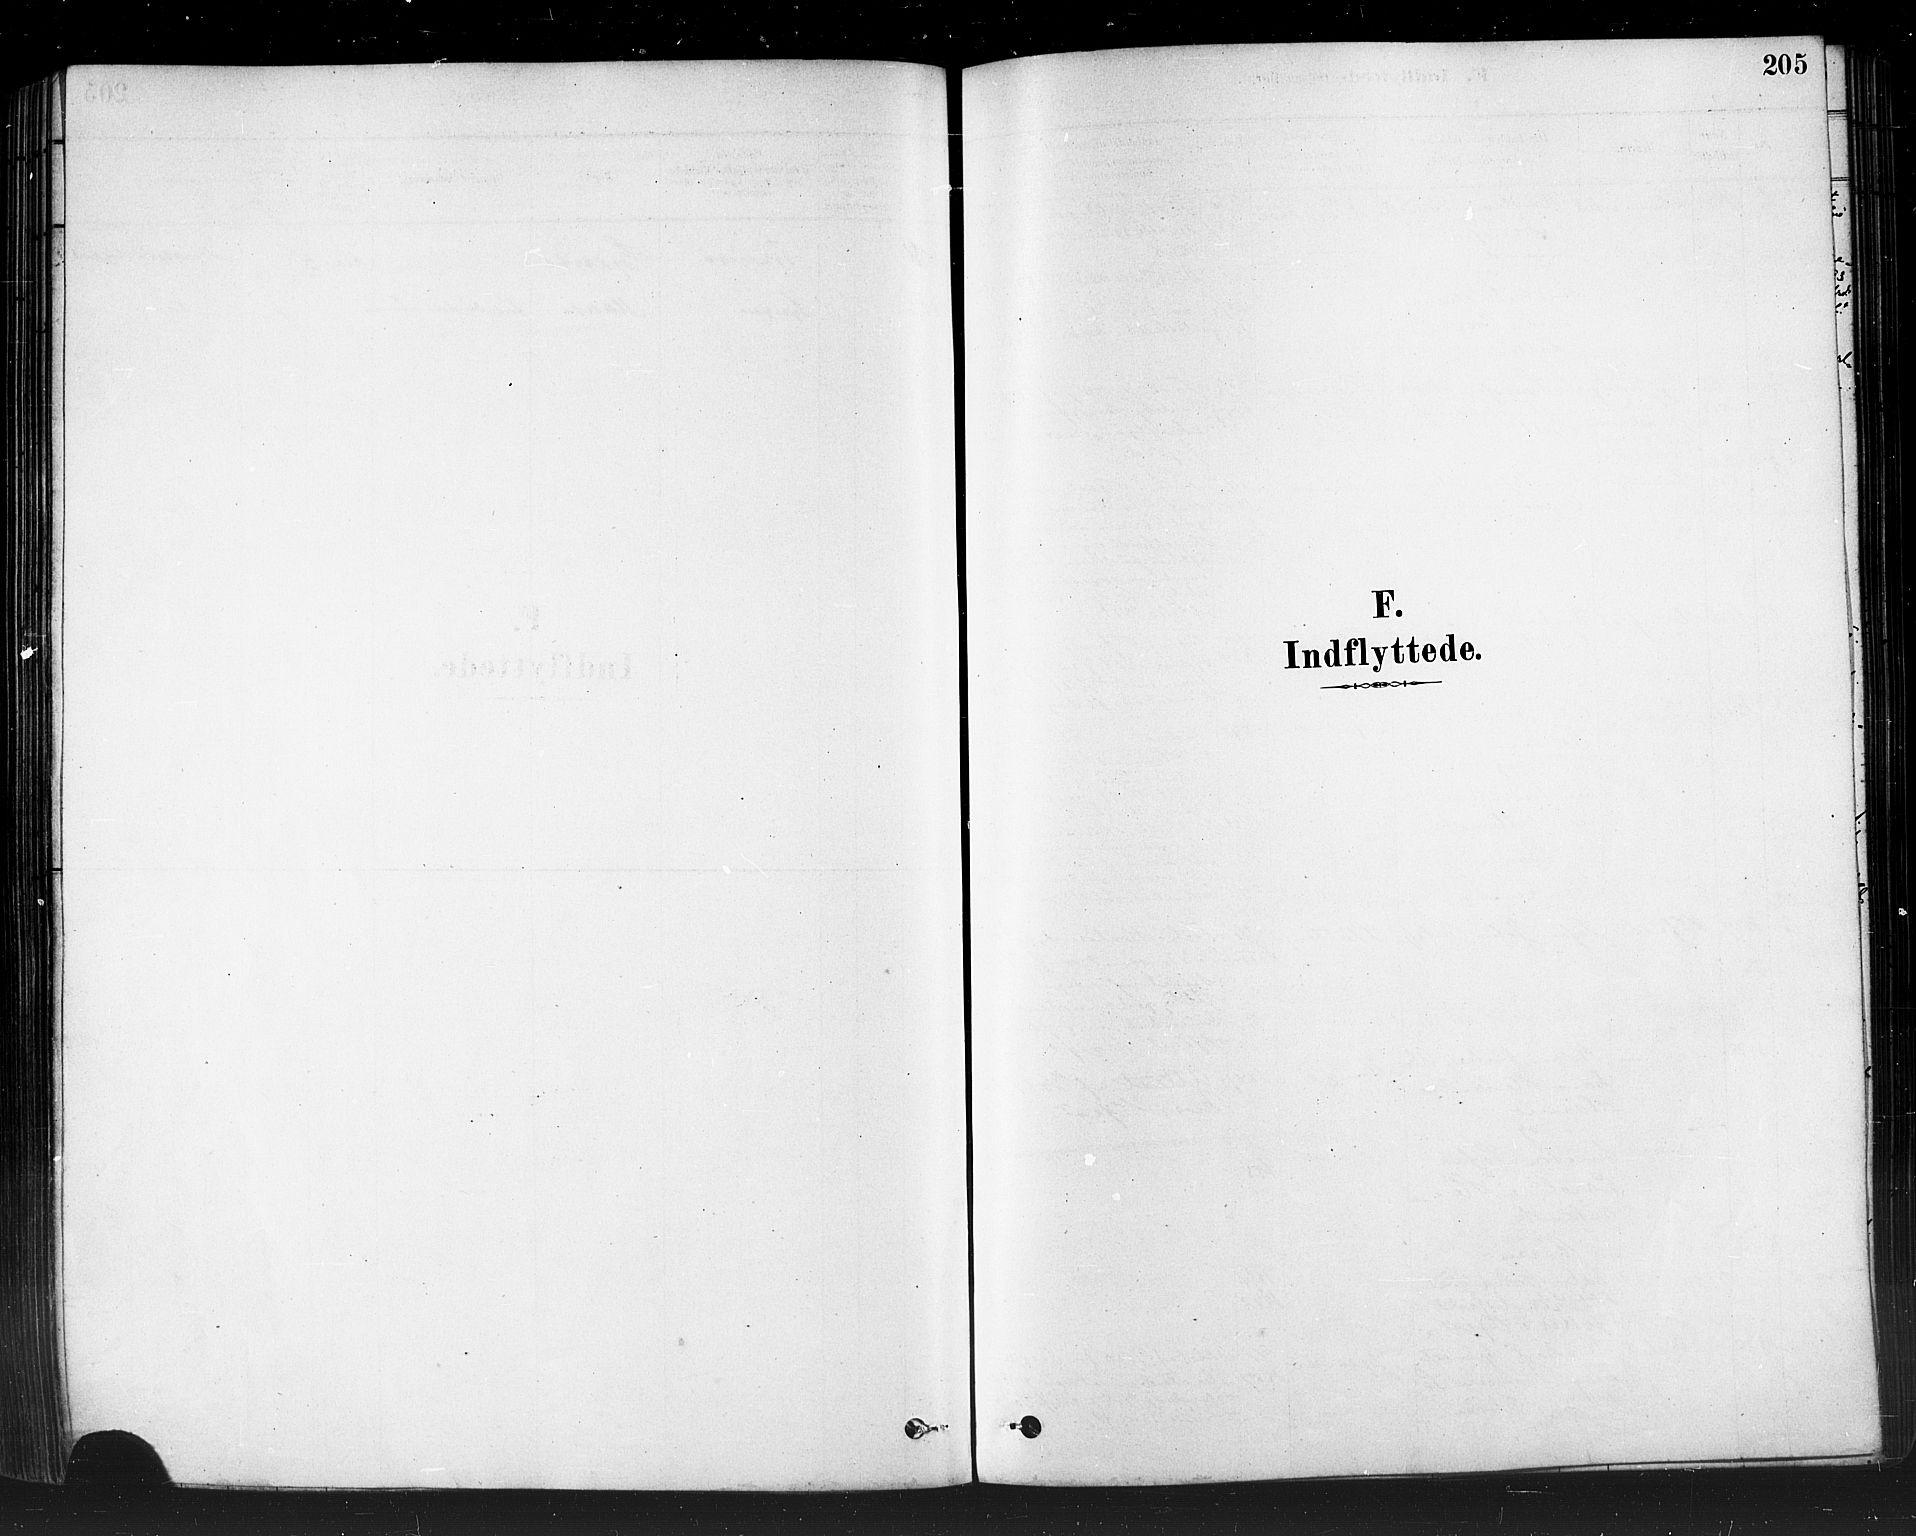 SATØ, Måsøy sokneprestkontor, H/Ha/L0004kirke: Ministerialbok nr. 4, 1878-1891, s. 205